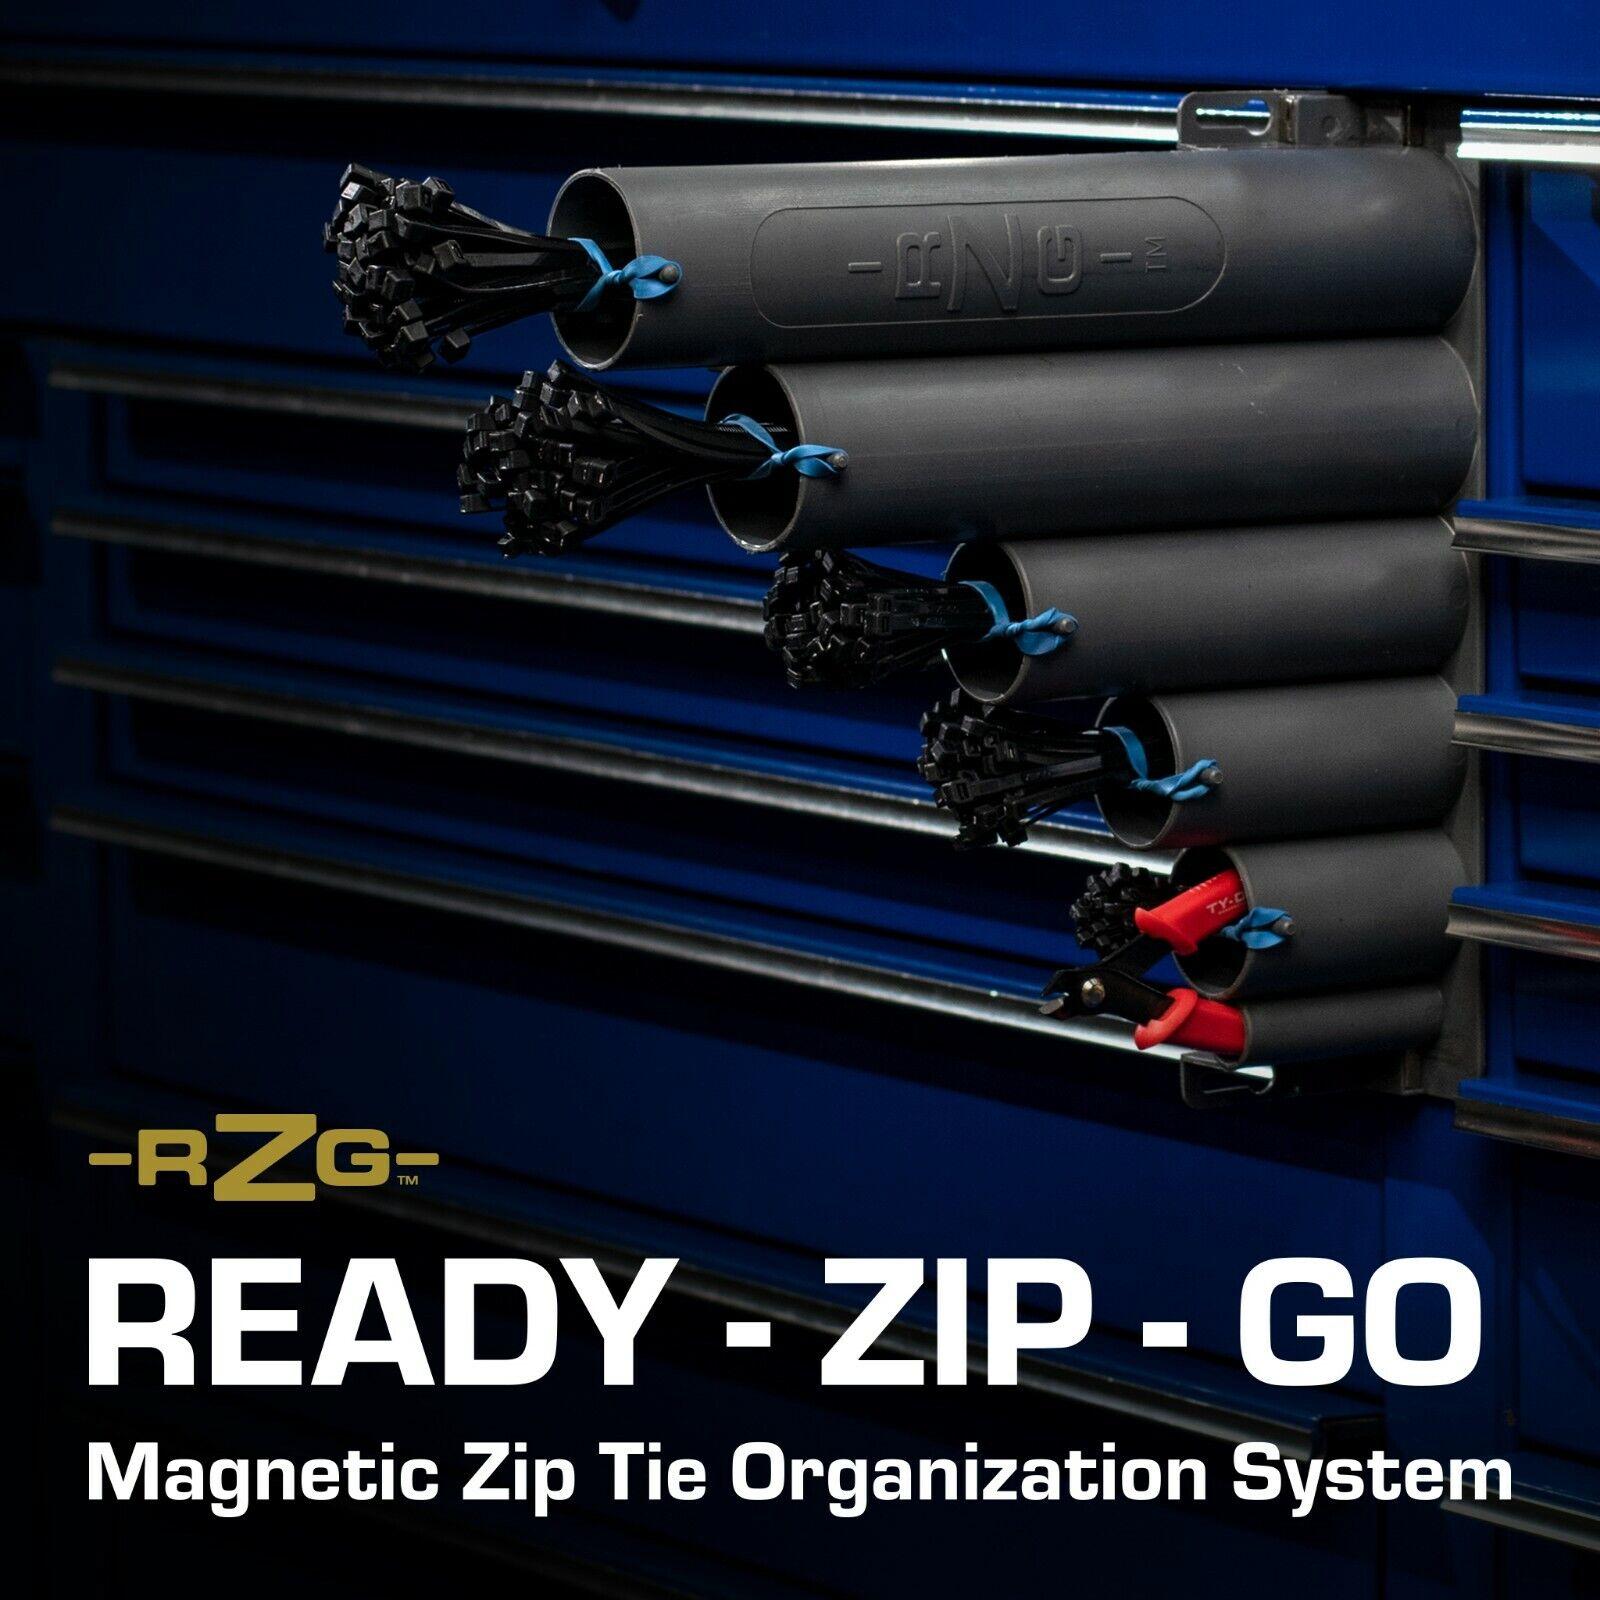 Zip Tie Organizer, Magnetic base, 250 zip ties and cutter in